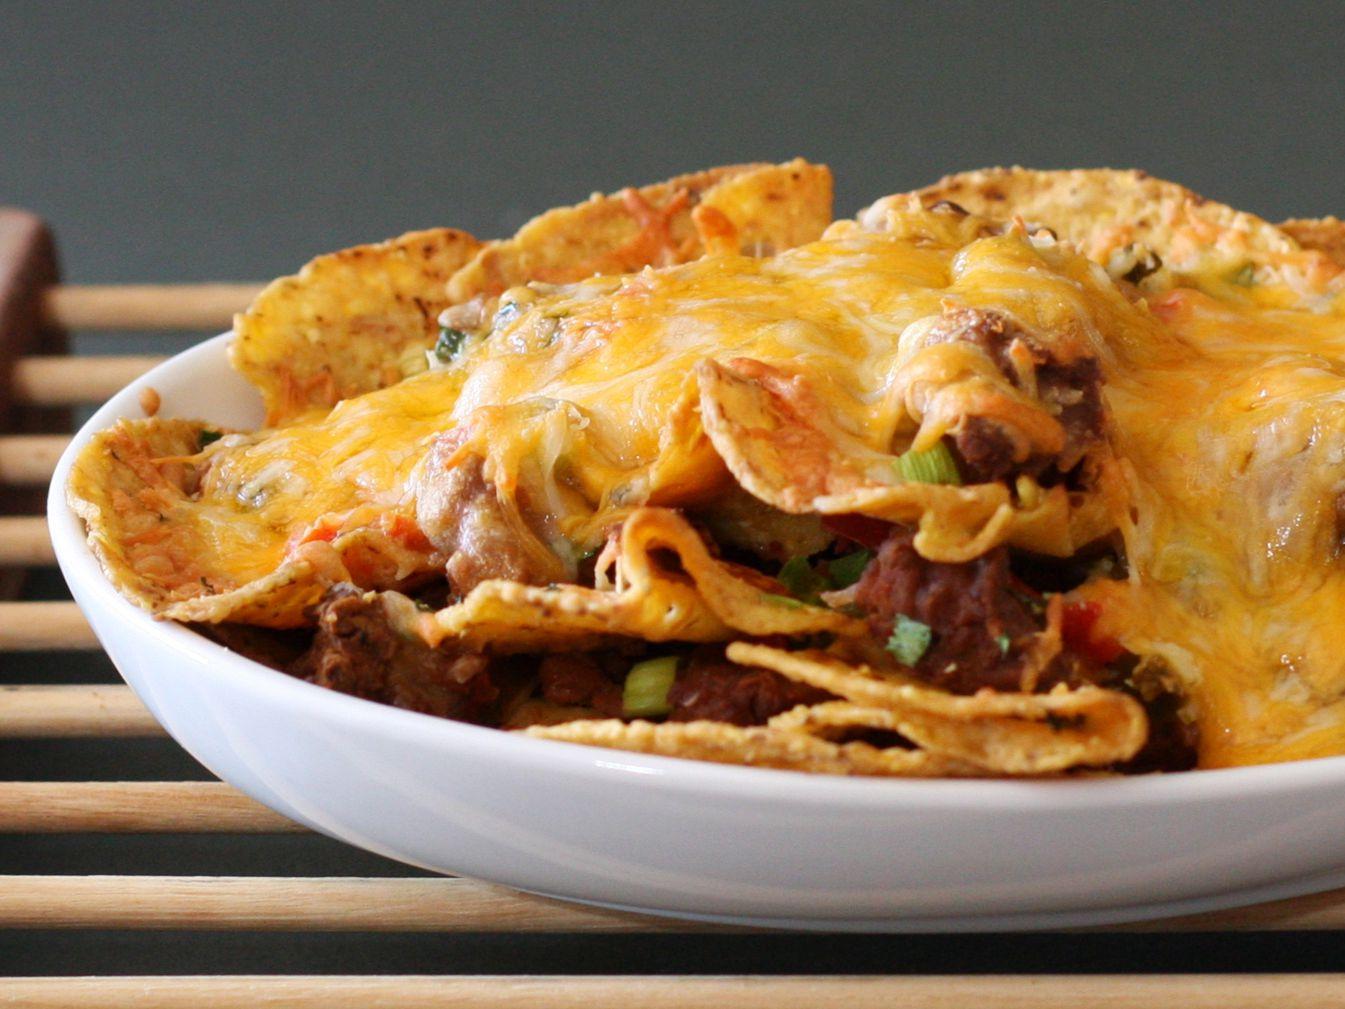 ground-beef-nachos-15-56a8ba0a3df78cf772